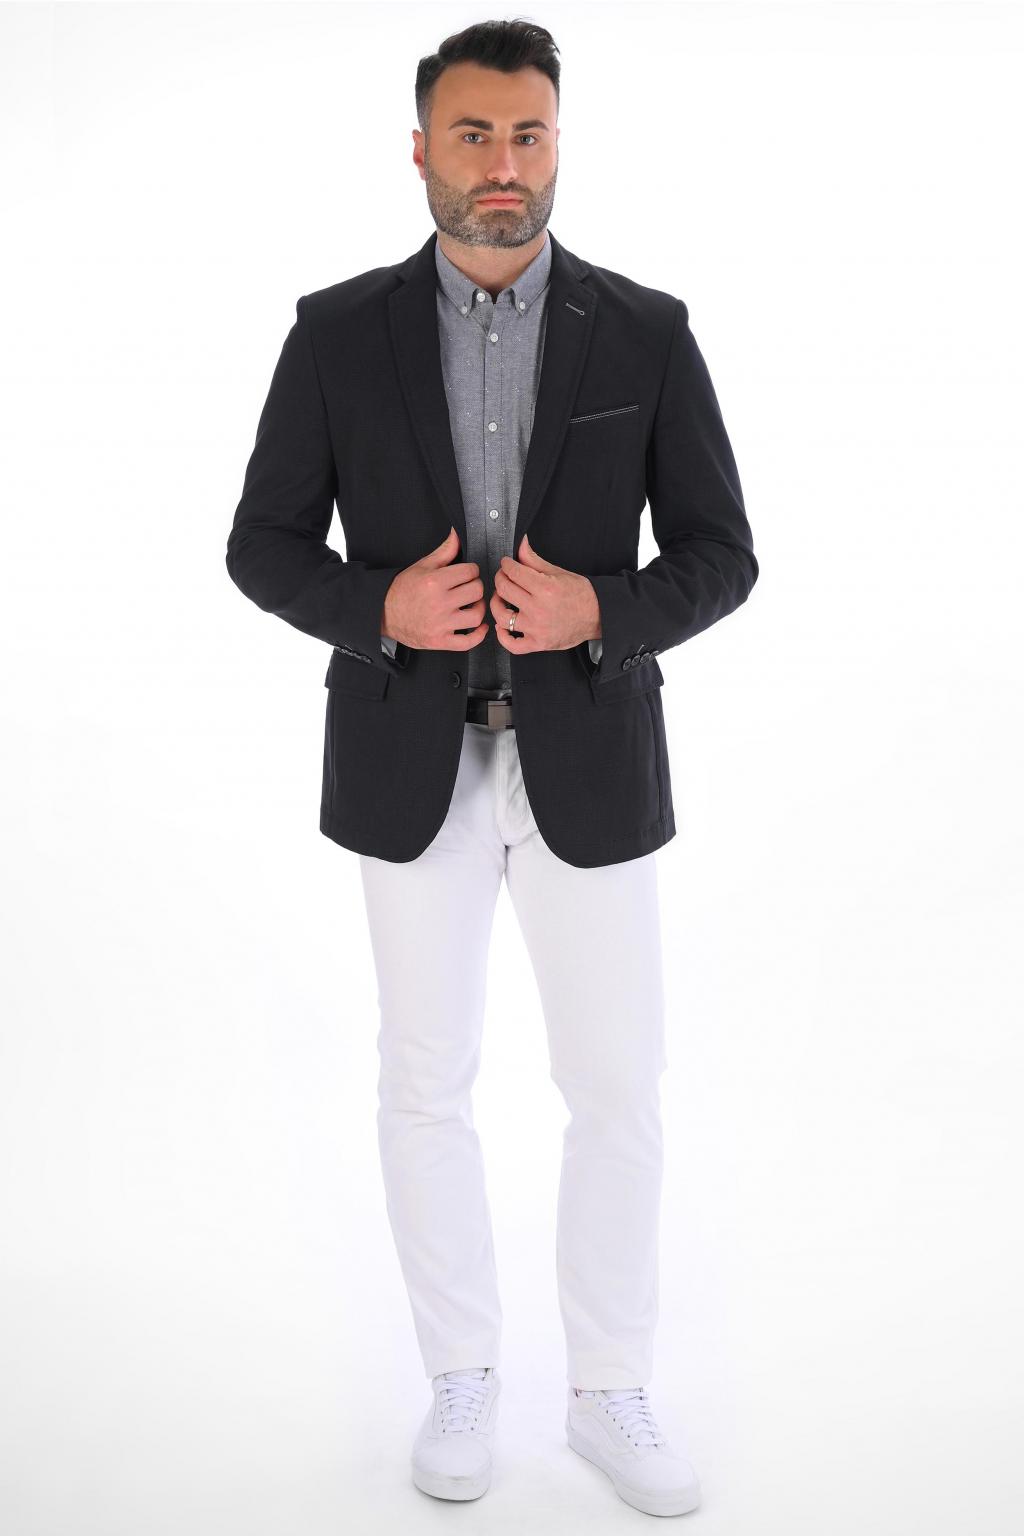 Čierne sako s mikrovzorom SLIM strih, bavlna stretch